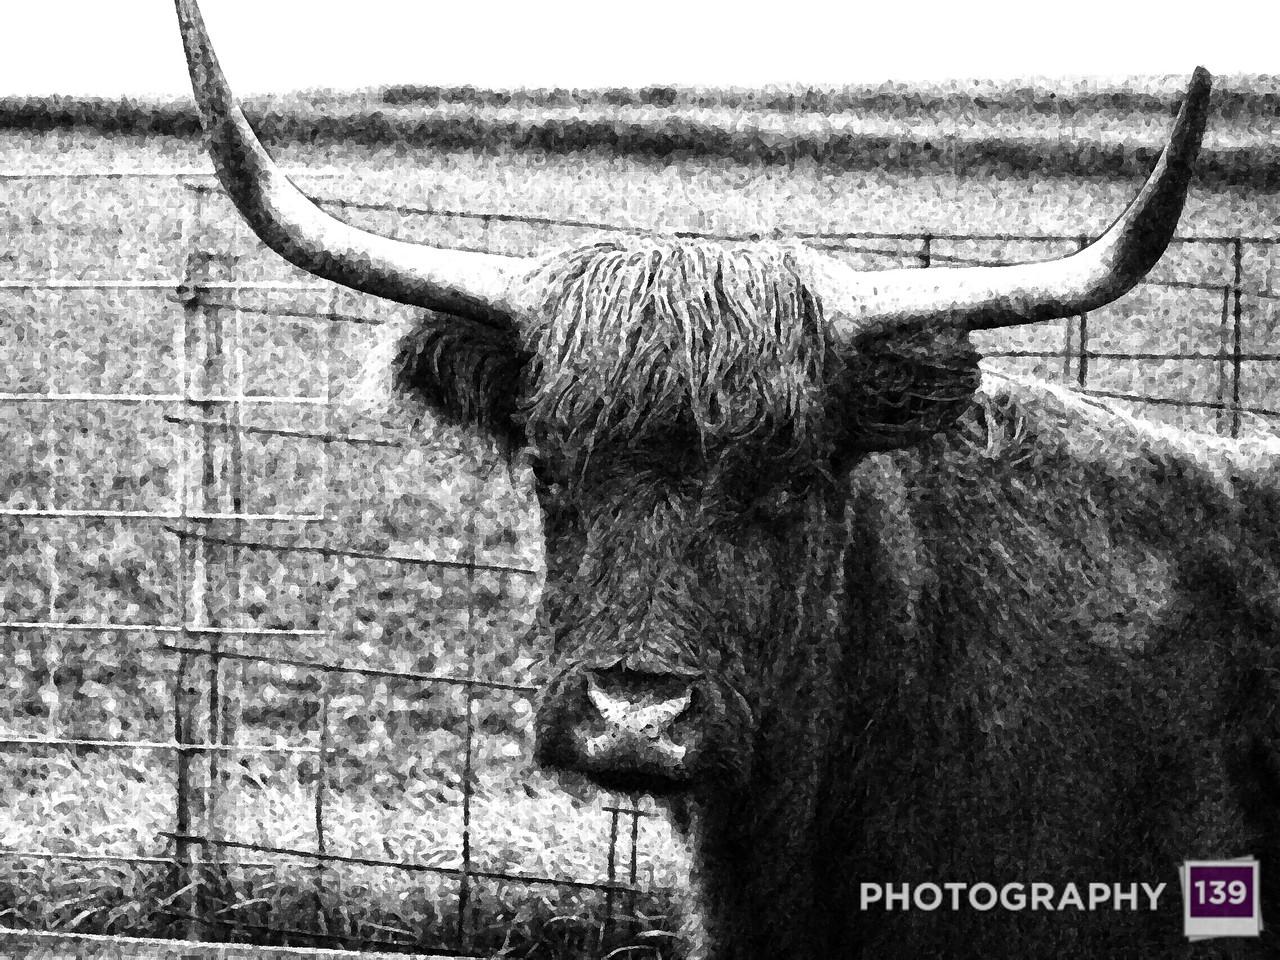 2005 Ogden Fun Days Photo Contest - Giotto's Bull